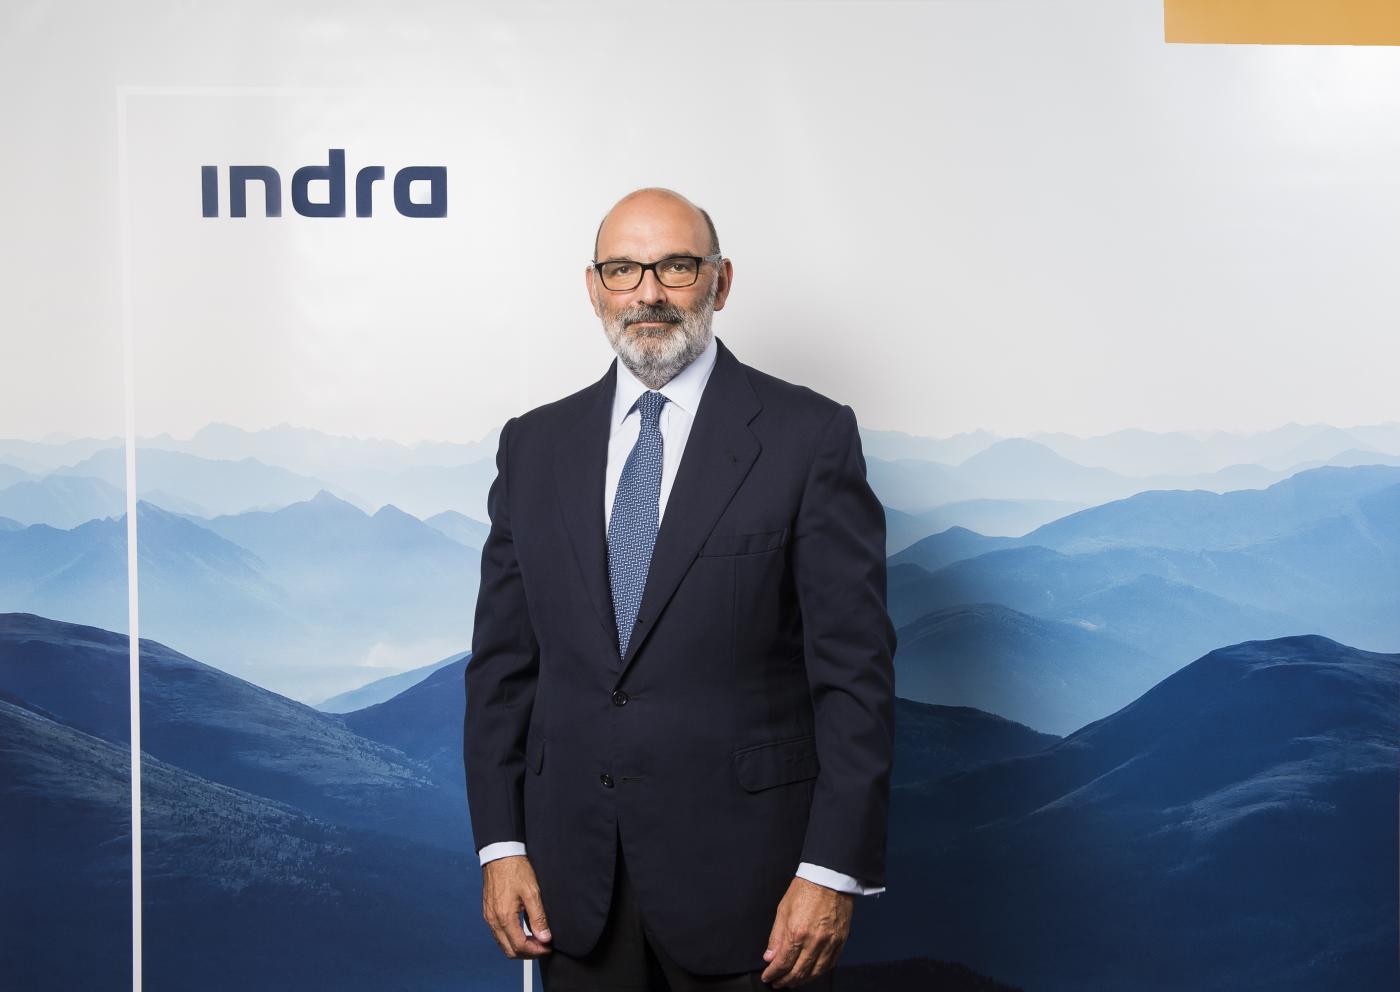 Fernando Abril Martorell, presidente de Indra. @Indra